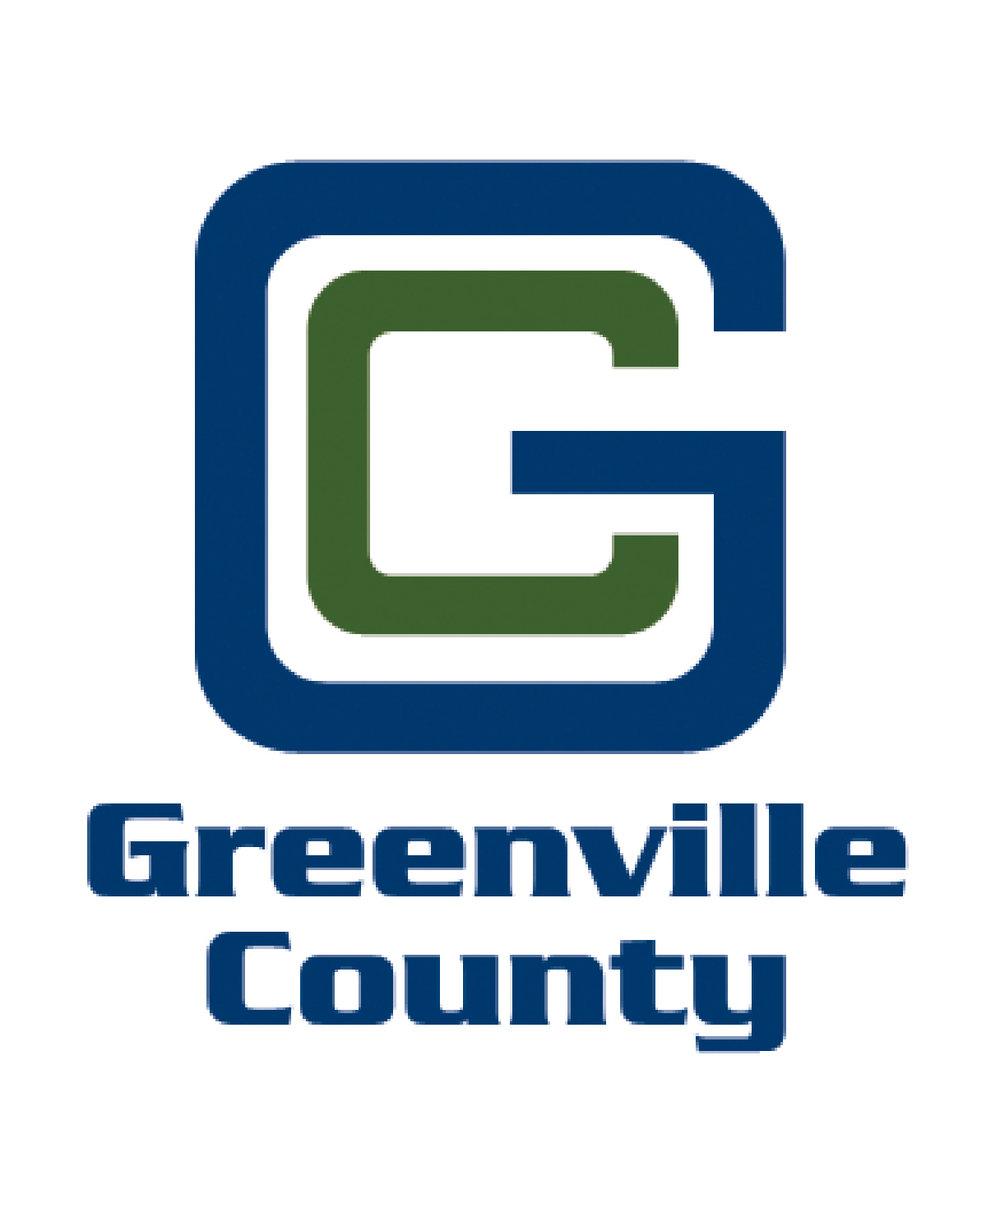 Greenville County.jpg